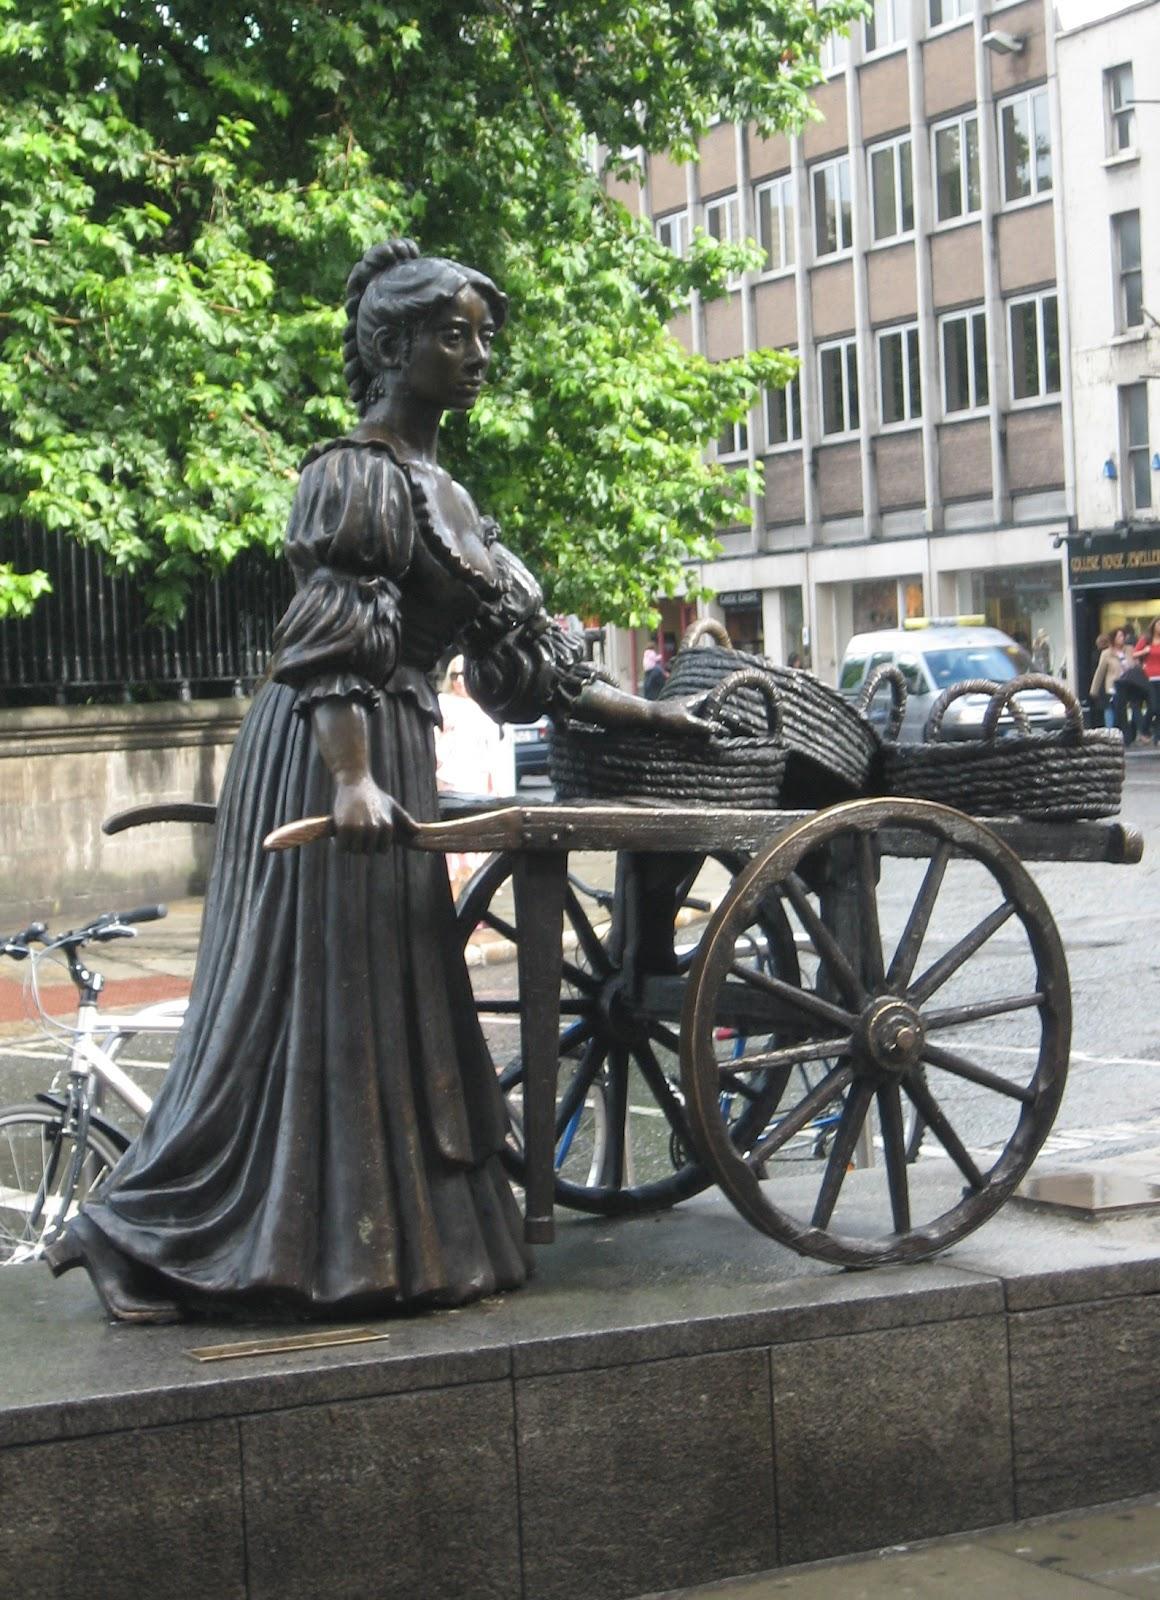 http://4.bp.blogspot.com/-UdcVhsNIV4M/UEeamJPUSFI/AAAAAAAABrE/AwRbKdxerRo/s1600/molly+malone+statue.jpg